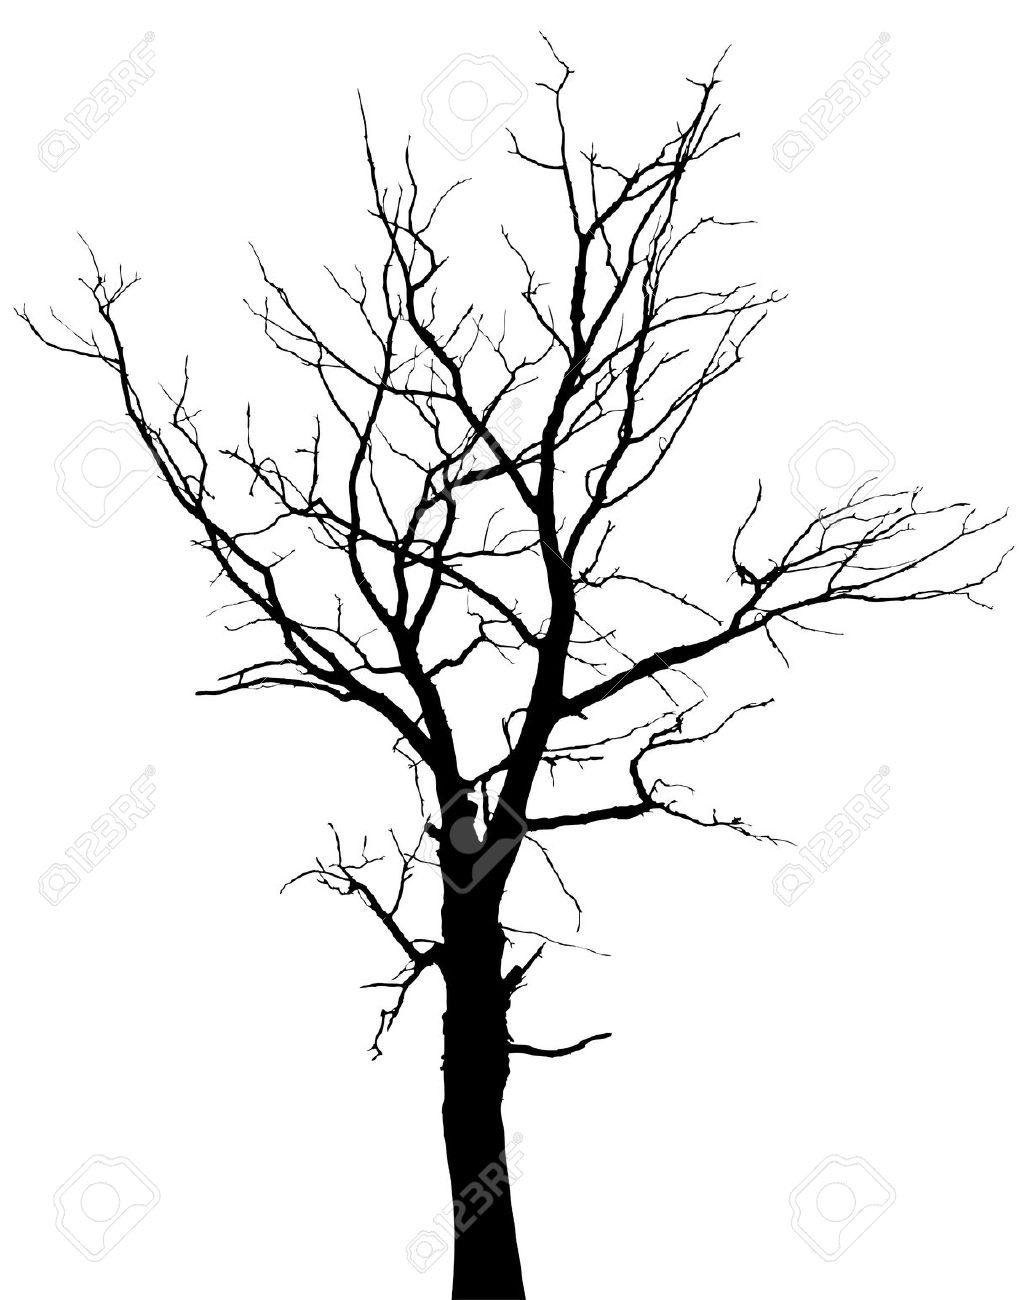 Drawn branch Background tree 114KB black hd